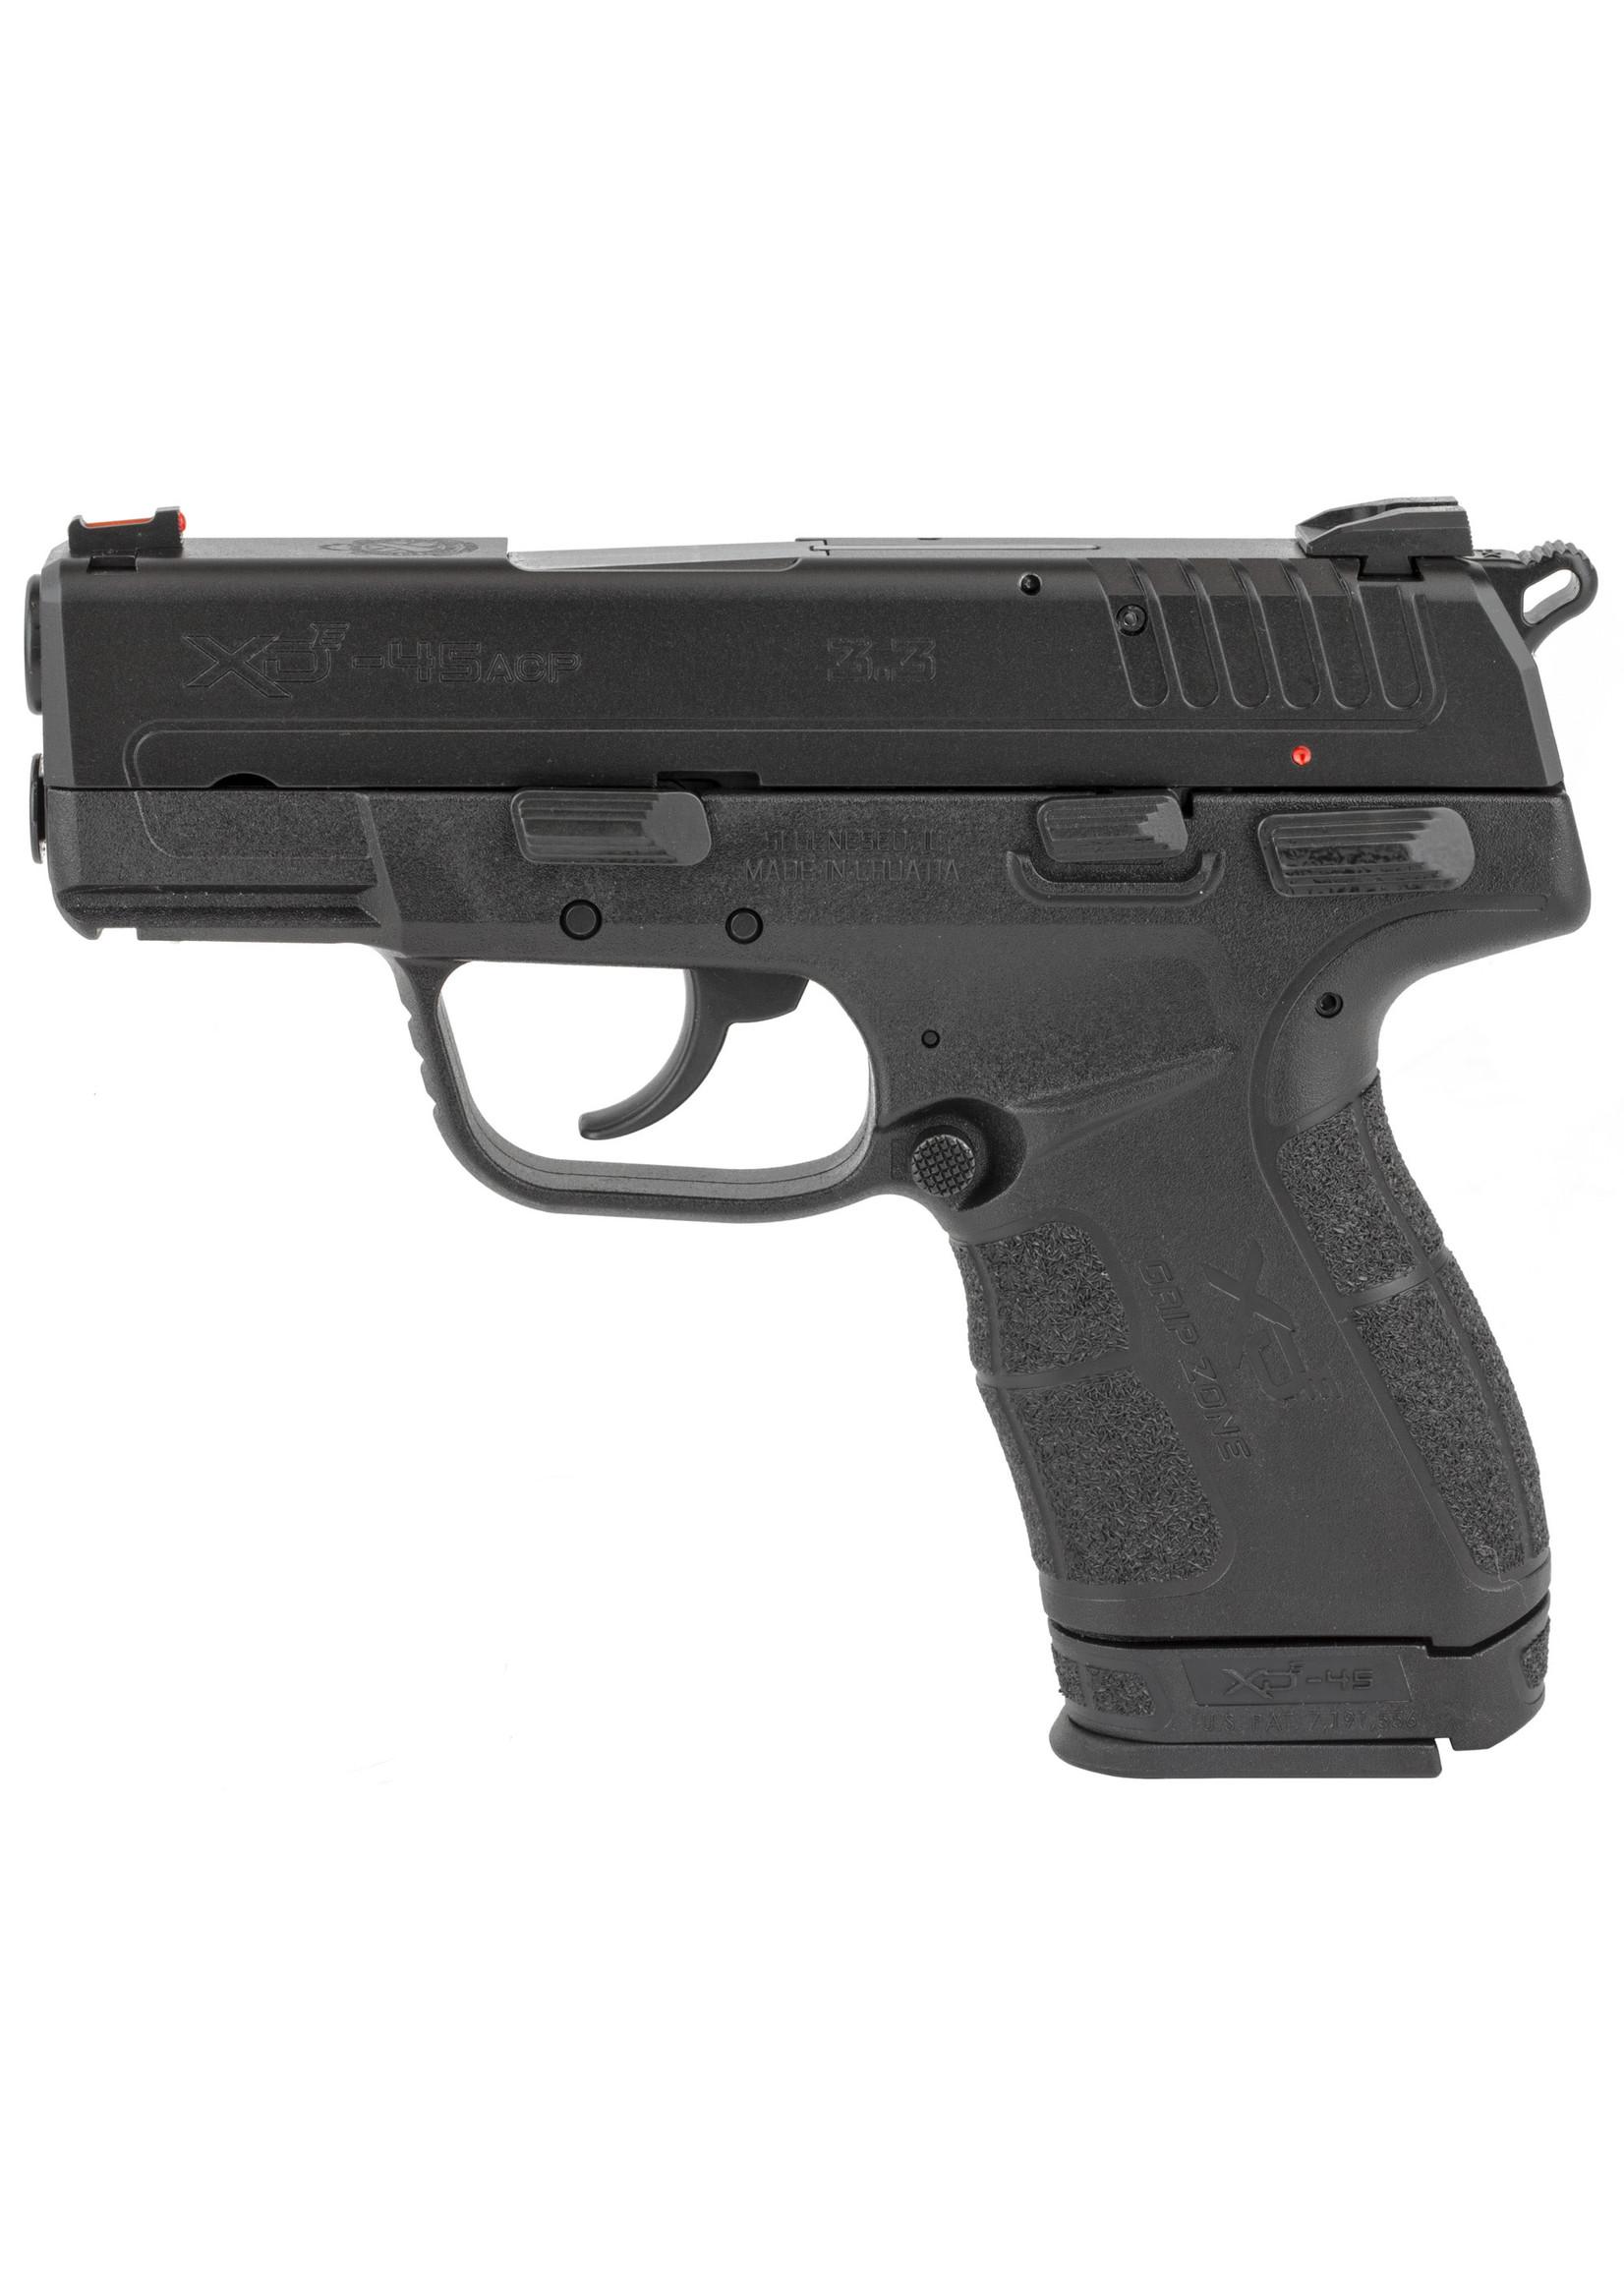 "Springfield Springfield Armory XDE 45 ACP, 3.30"", 7+1, Black, Melonite Steel Slide, Black Polymer Grip"